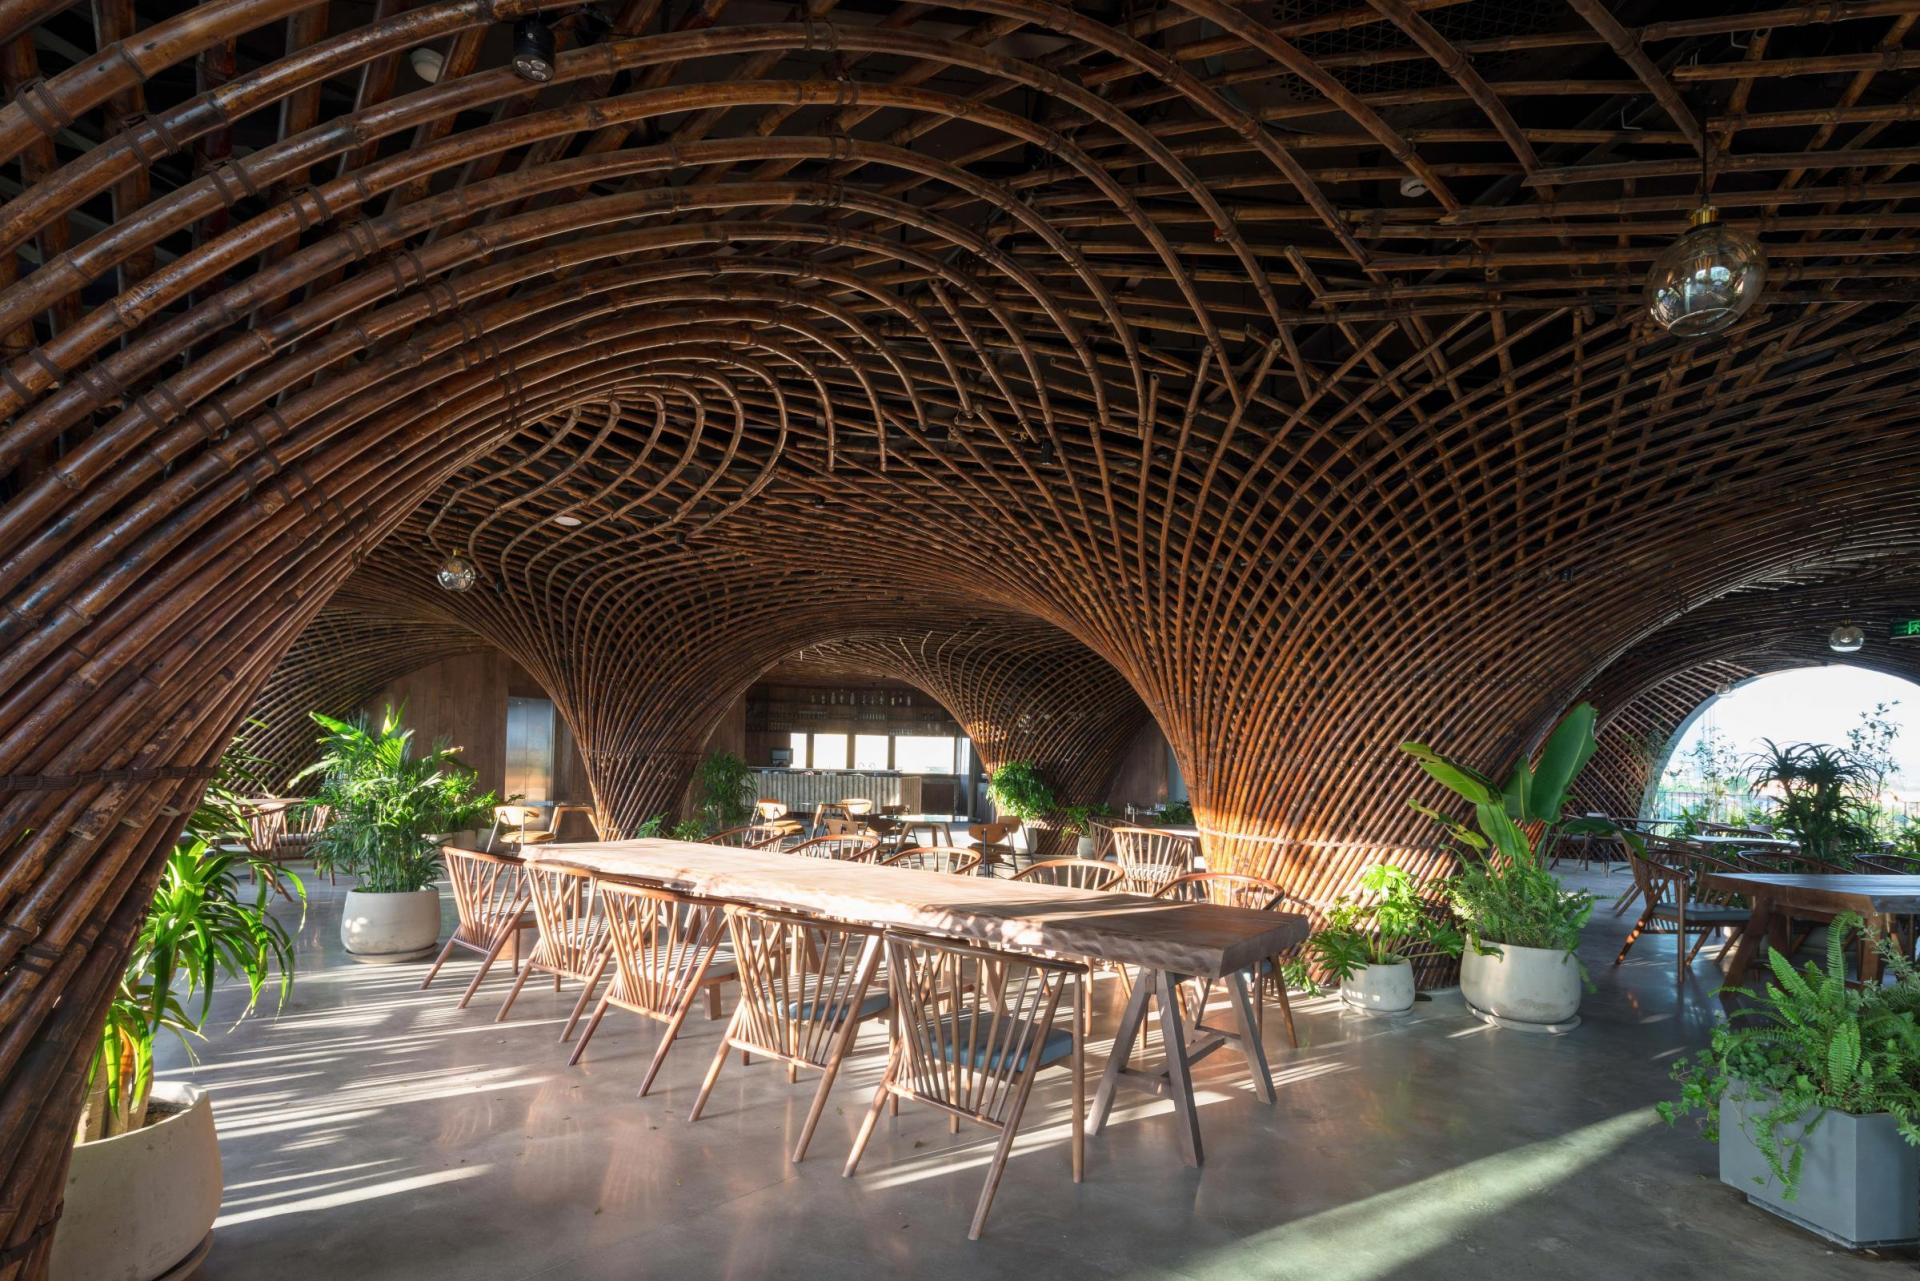 coffee shop in vietnam wins intl architecture award